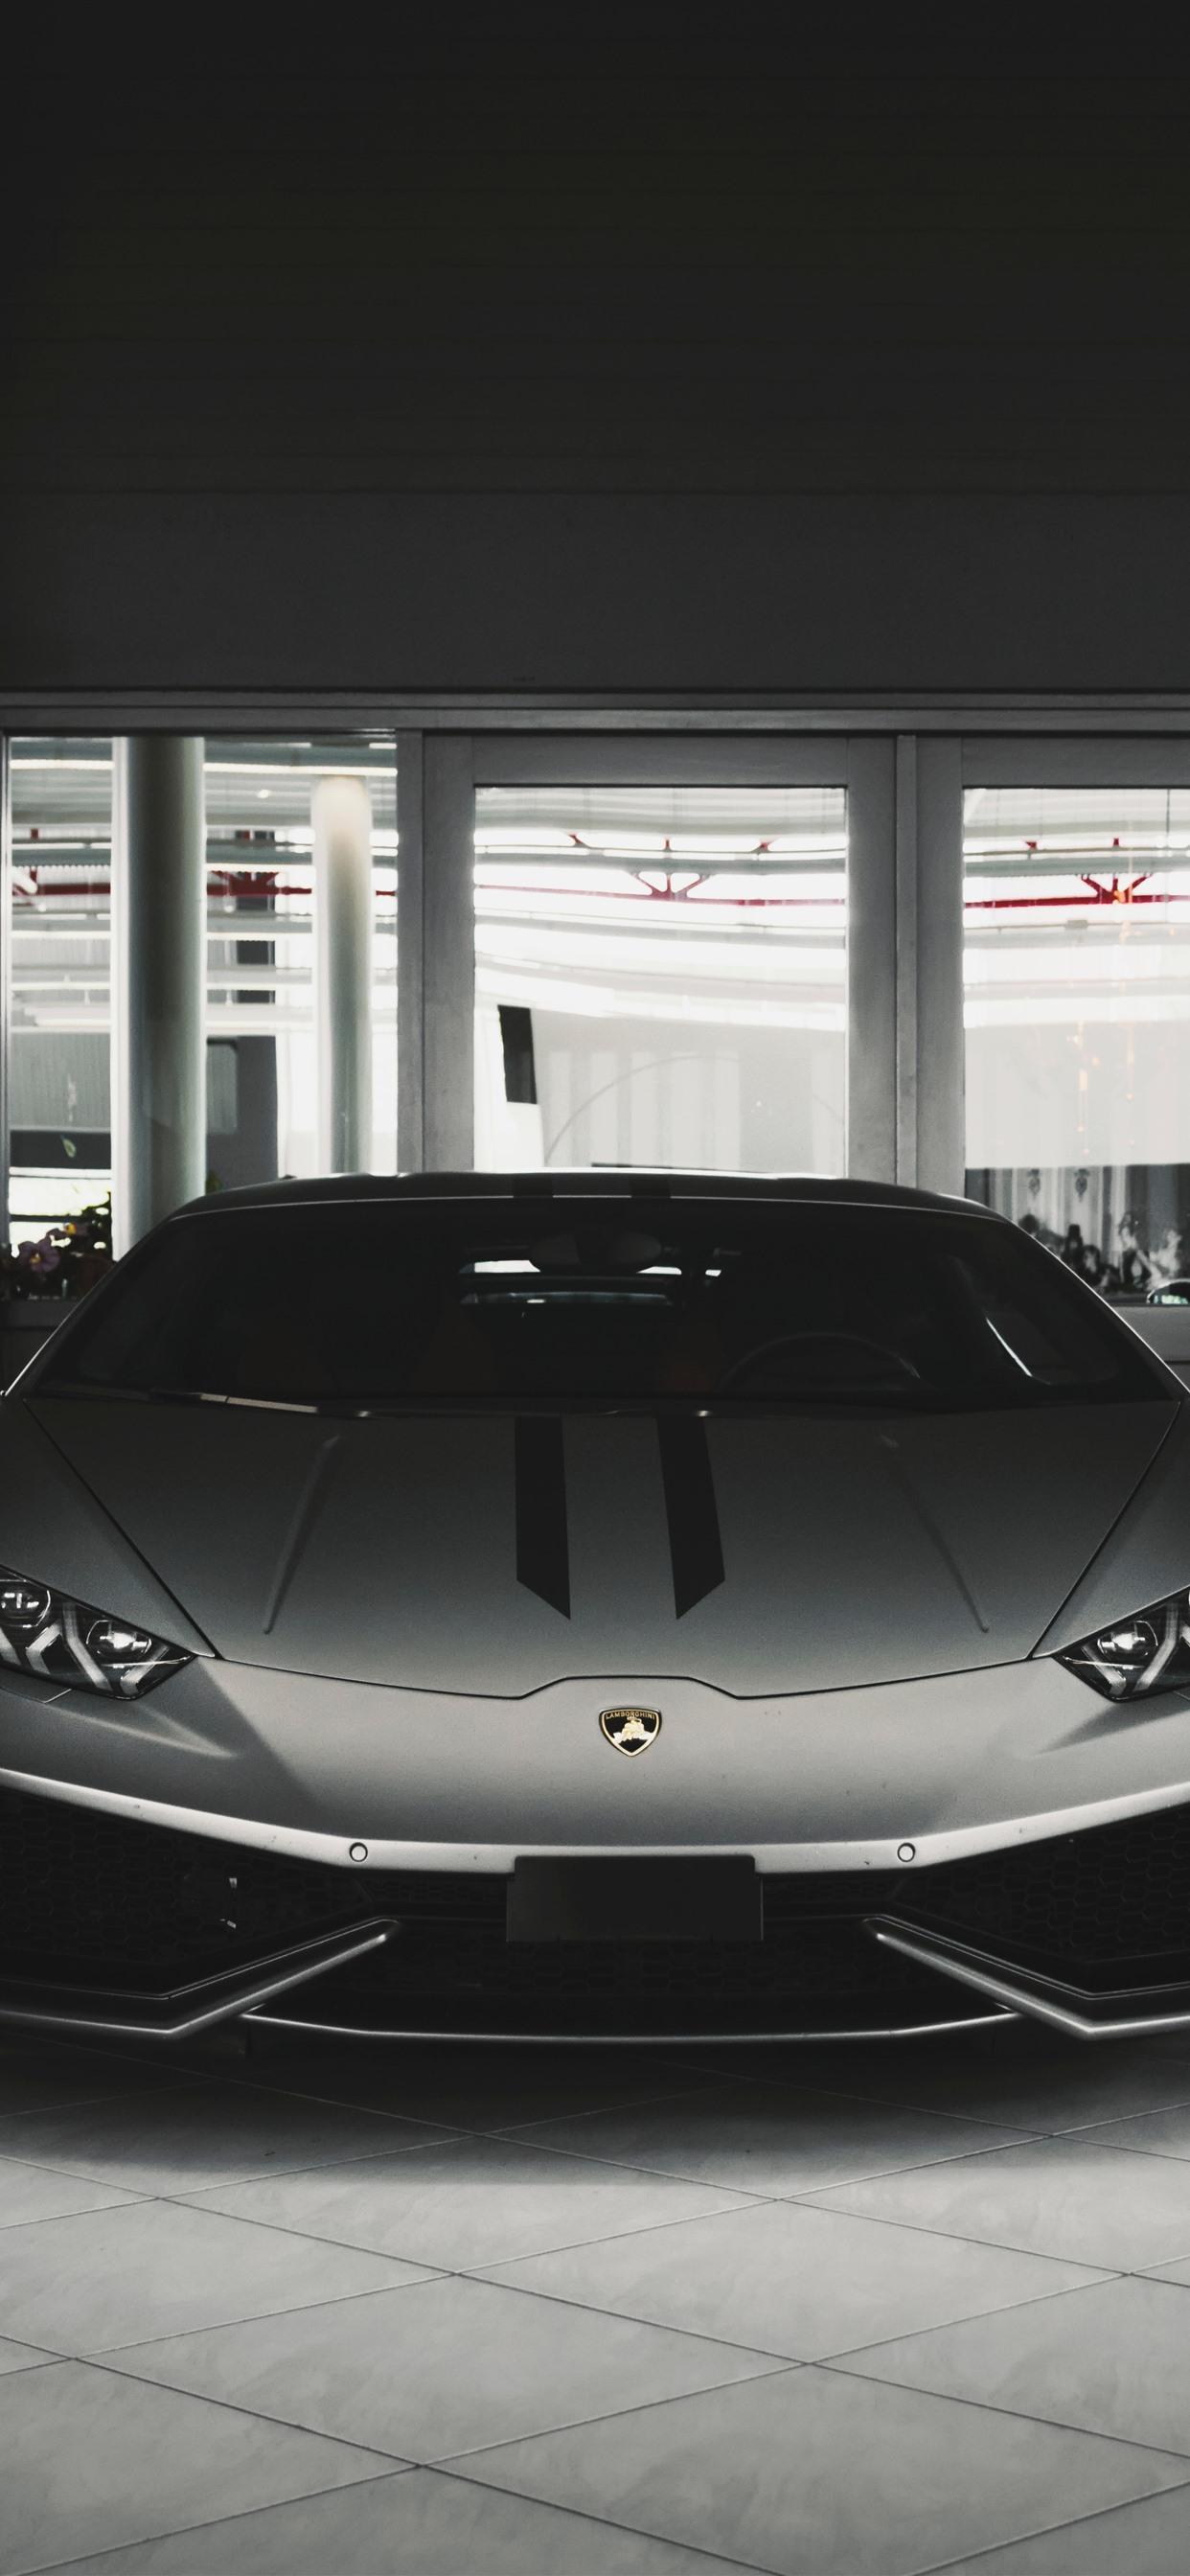 Wallpaper Lamborghini Silver Car Front View 3840x2160 Uhd 4k Picture